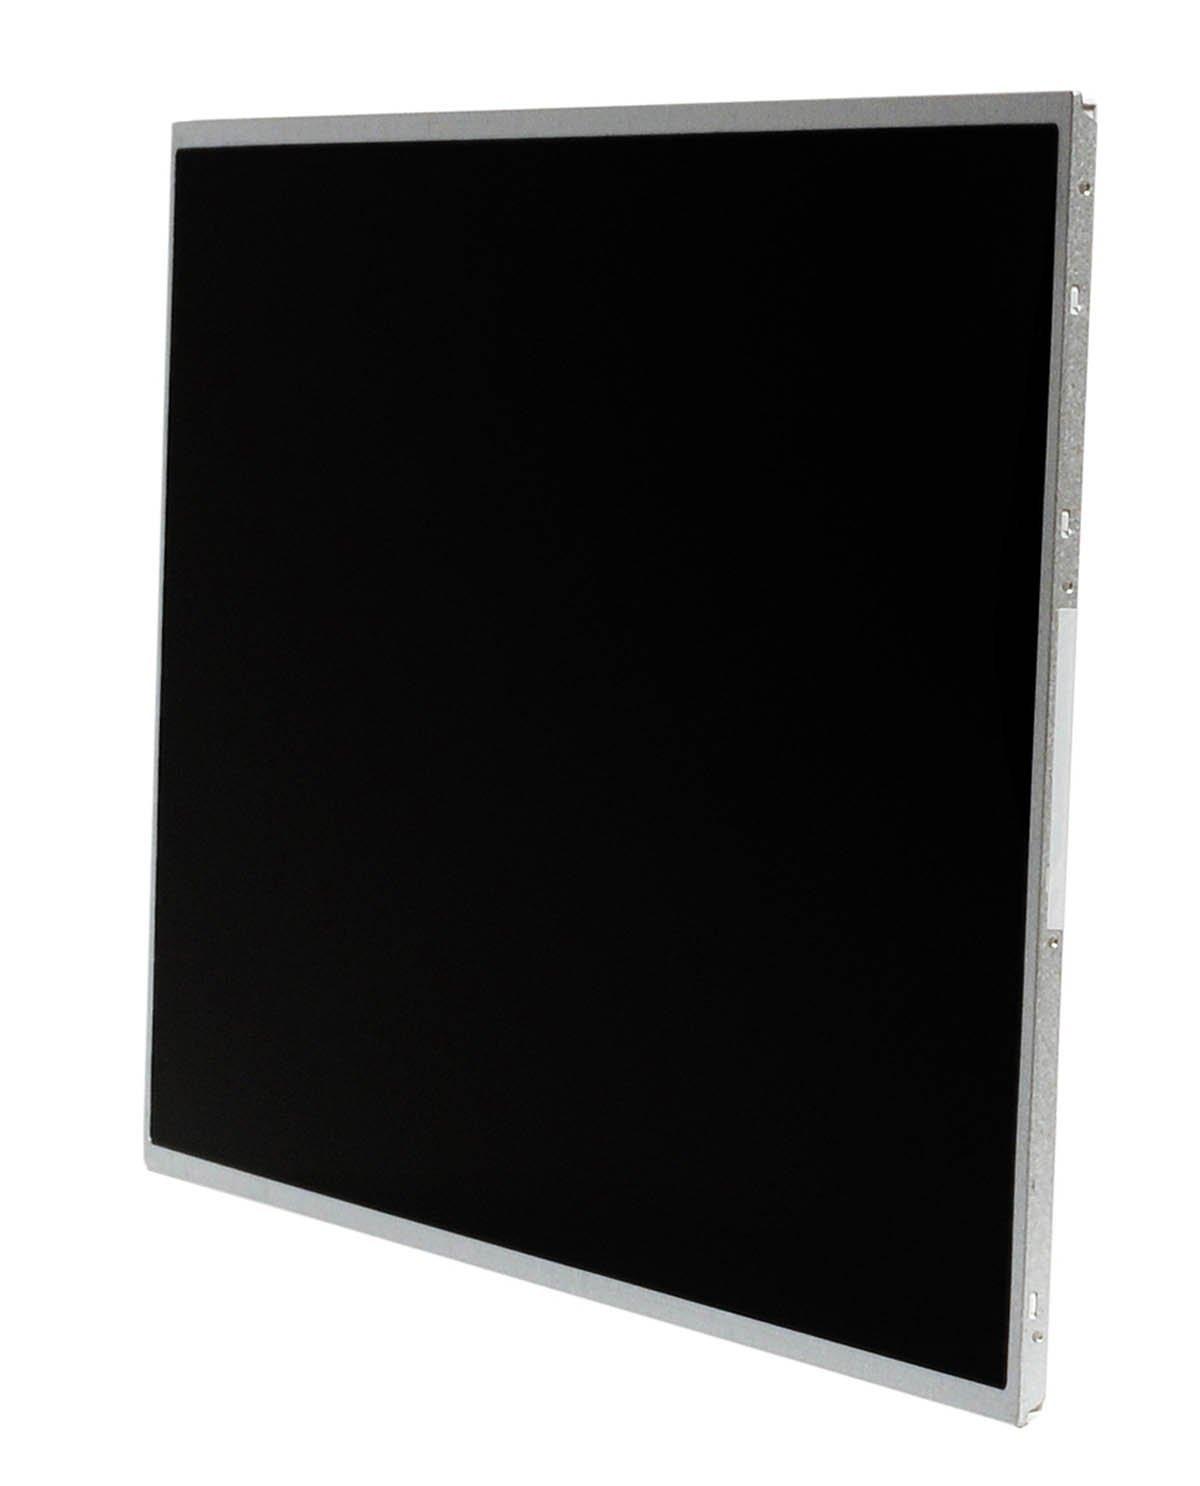 "Здесь можно купить  for Acer Aspire E1-530G-21174G50Mnkk LCD Display Schermo Screen 15.6"" LED bet  Компьютер & сеть"